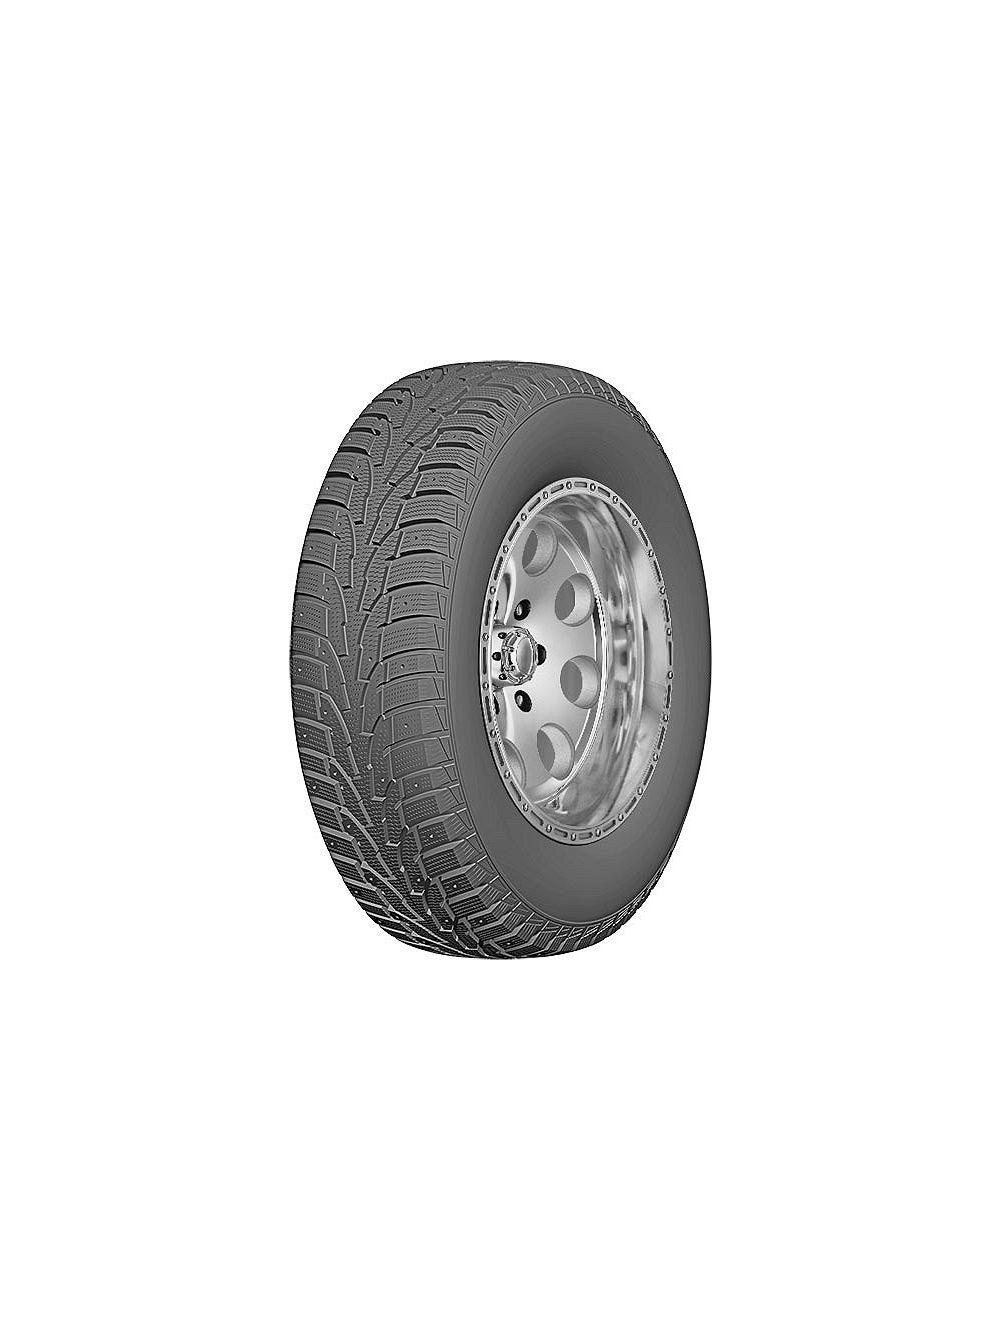 Infinity 255/55R18 T Ecosnow SUV XL Téli gumi